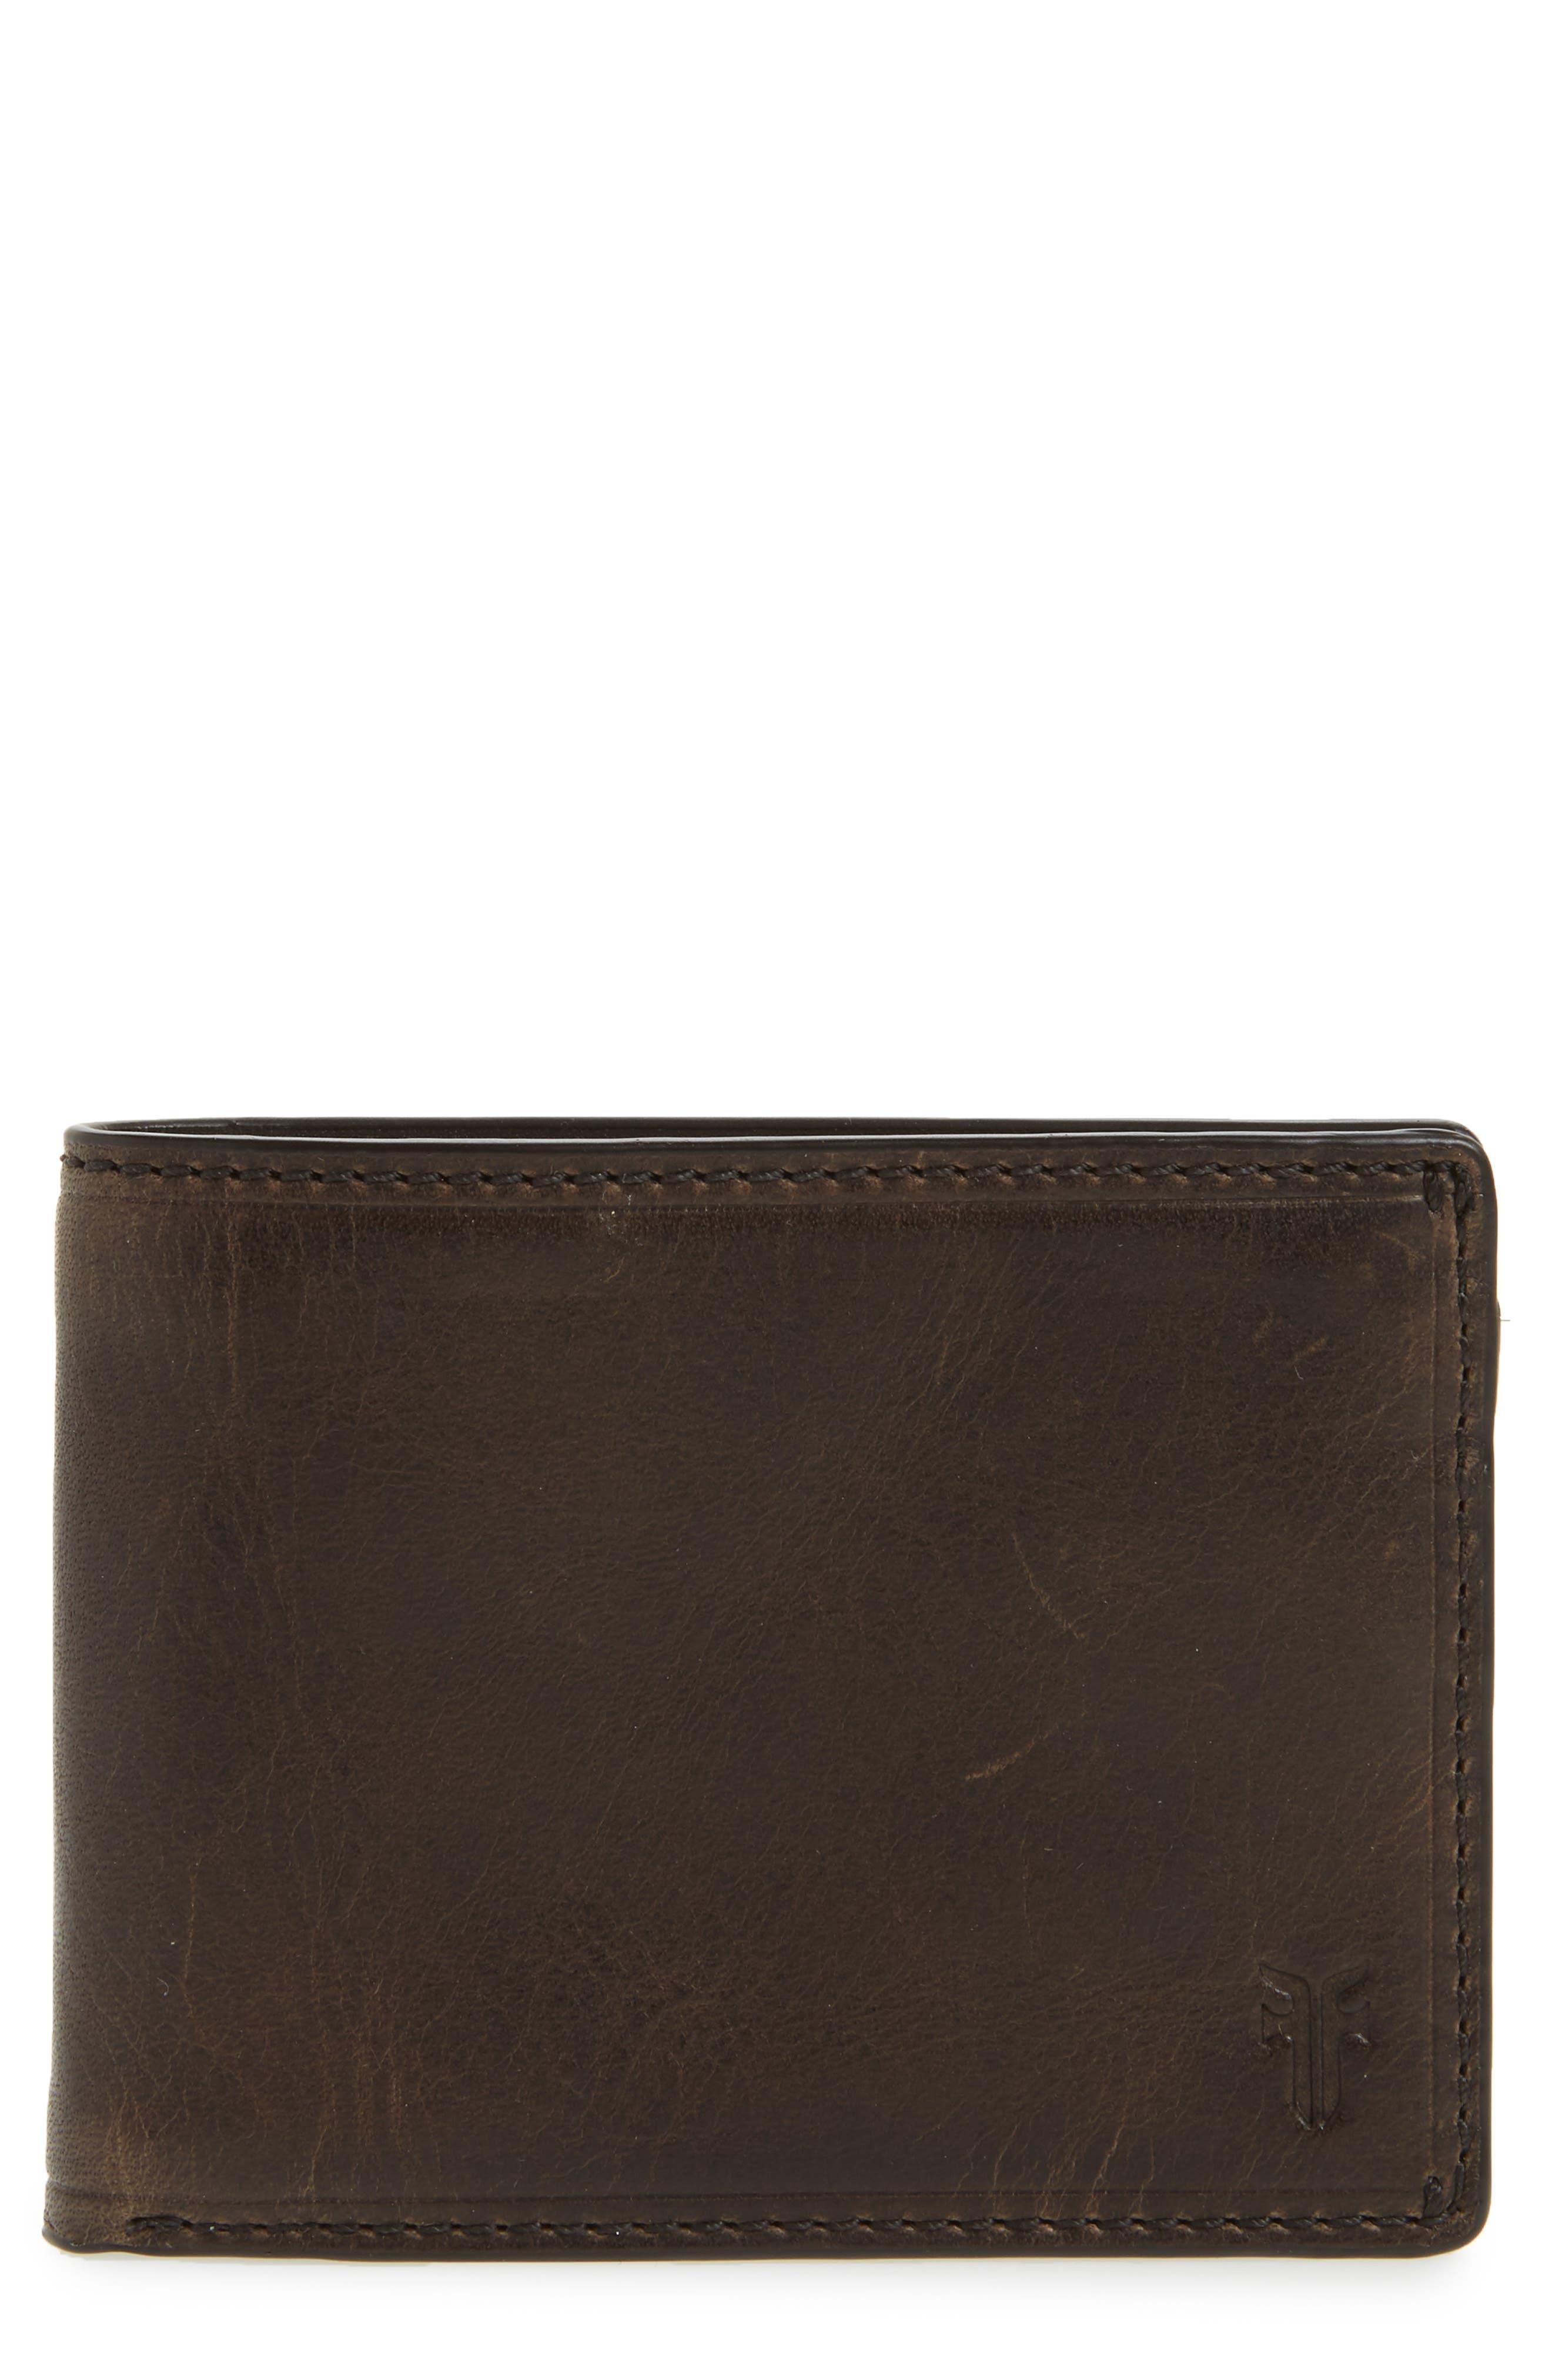 Logan Leather Wallet,                         Main,                         color, Slate